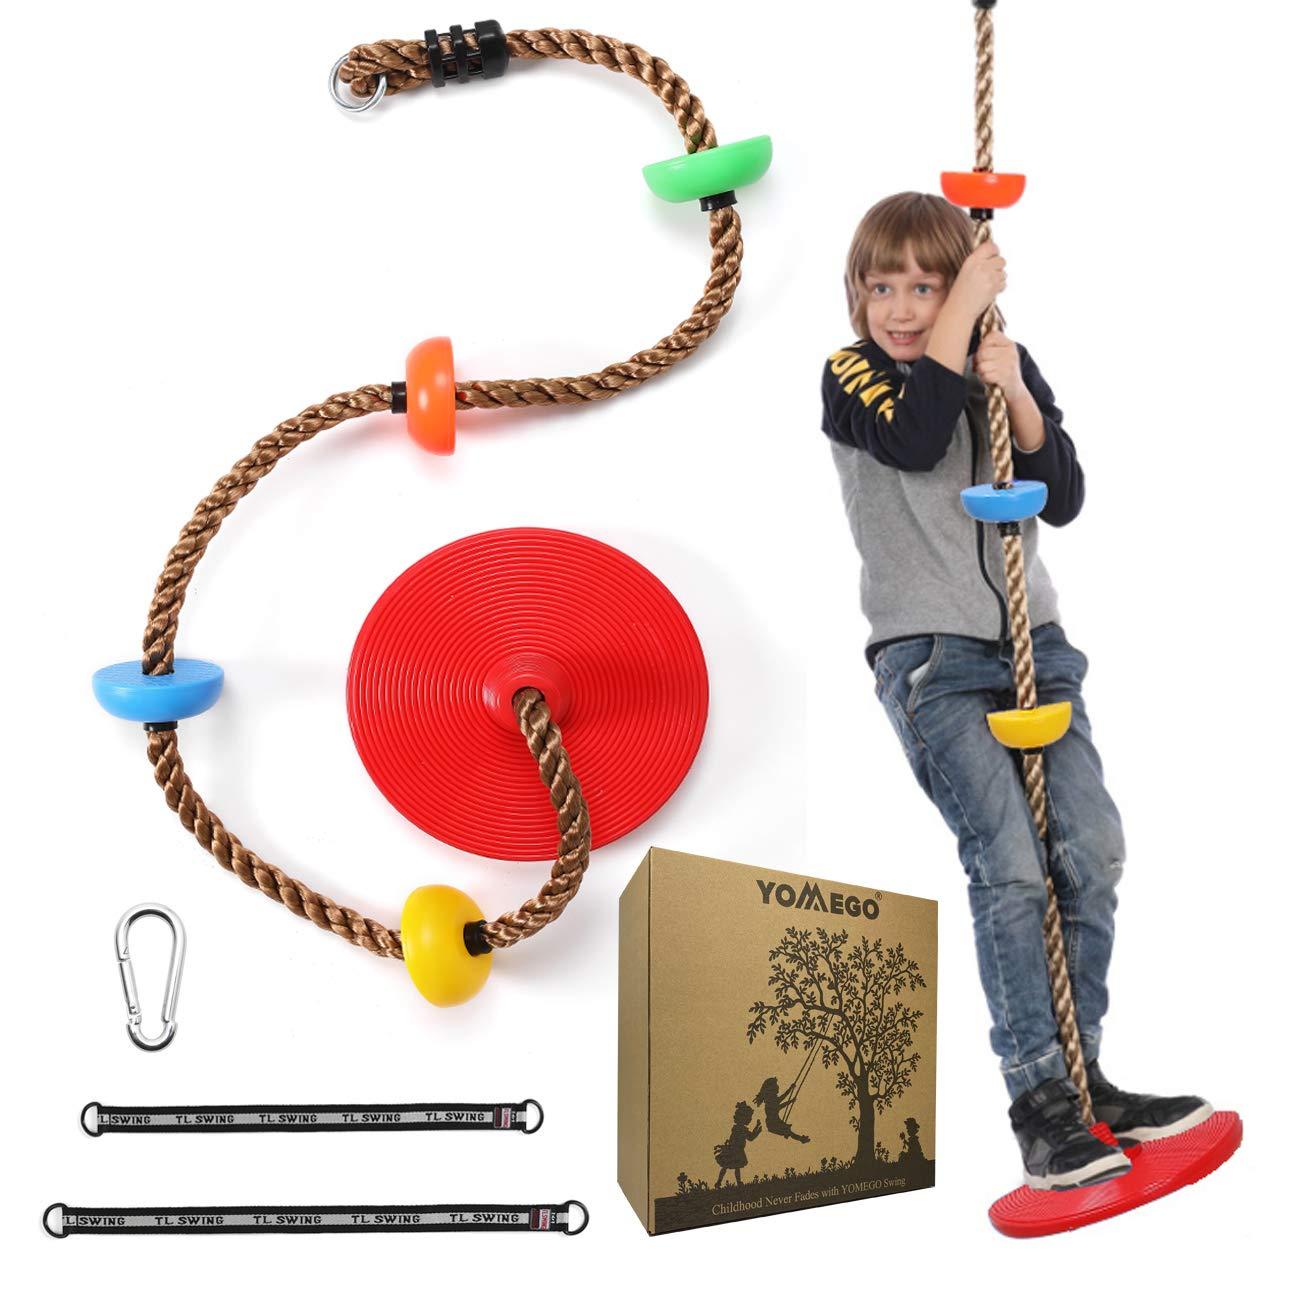 YOMEGO Climbing Tree Swing Saucer Swing with Heavy Duty Rope Good Backyard